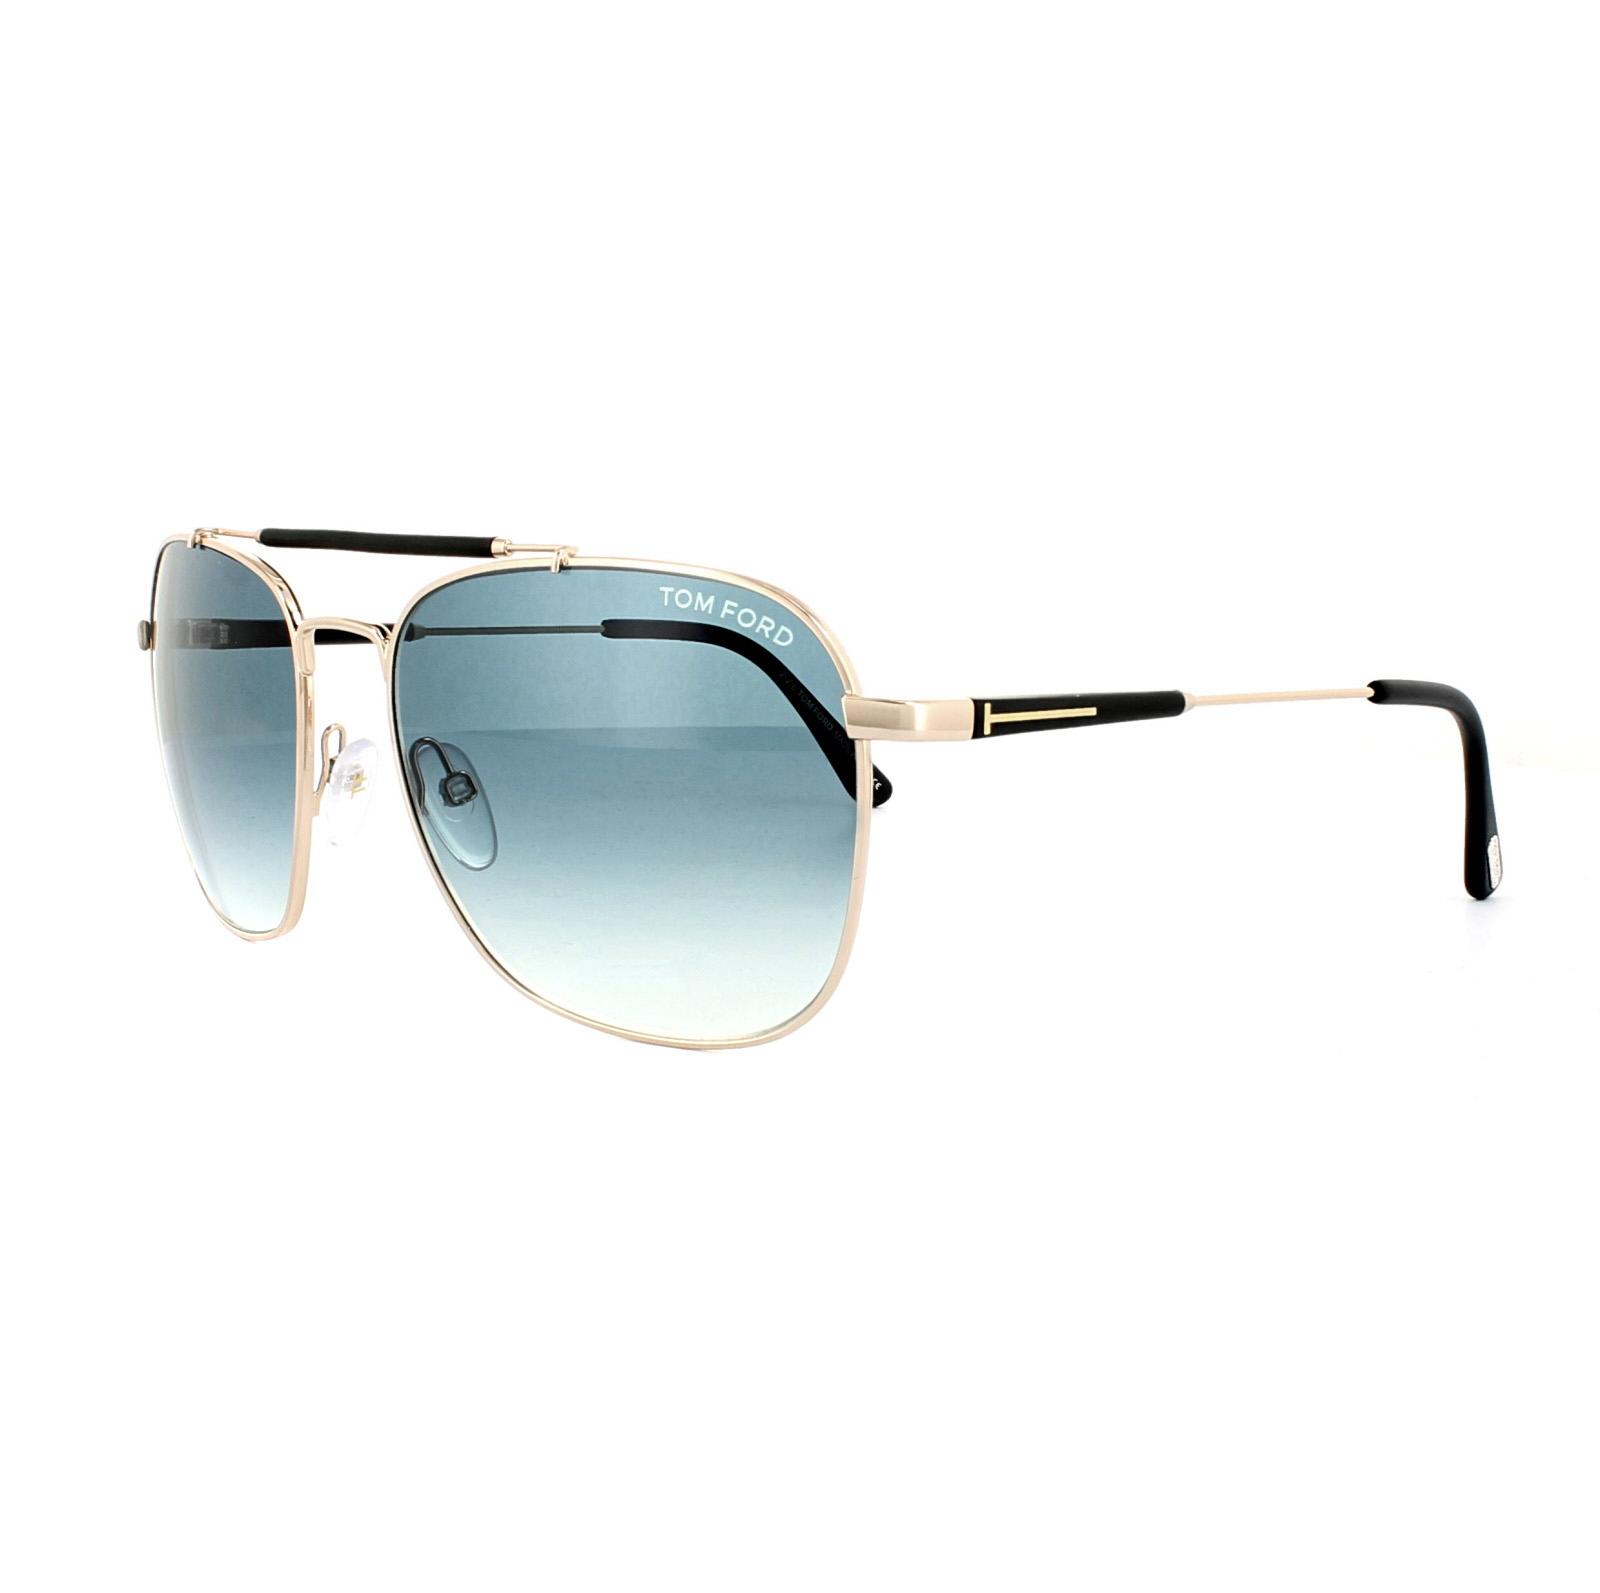 ea680a95c2f Sentinel Tom Ford Sunglasses FT0377 Edward 28W Polished Rose Gold Blue  Gradient